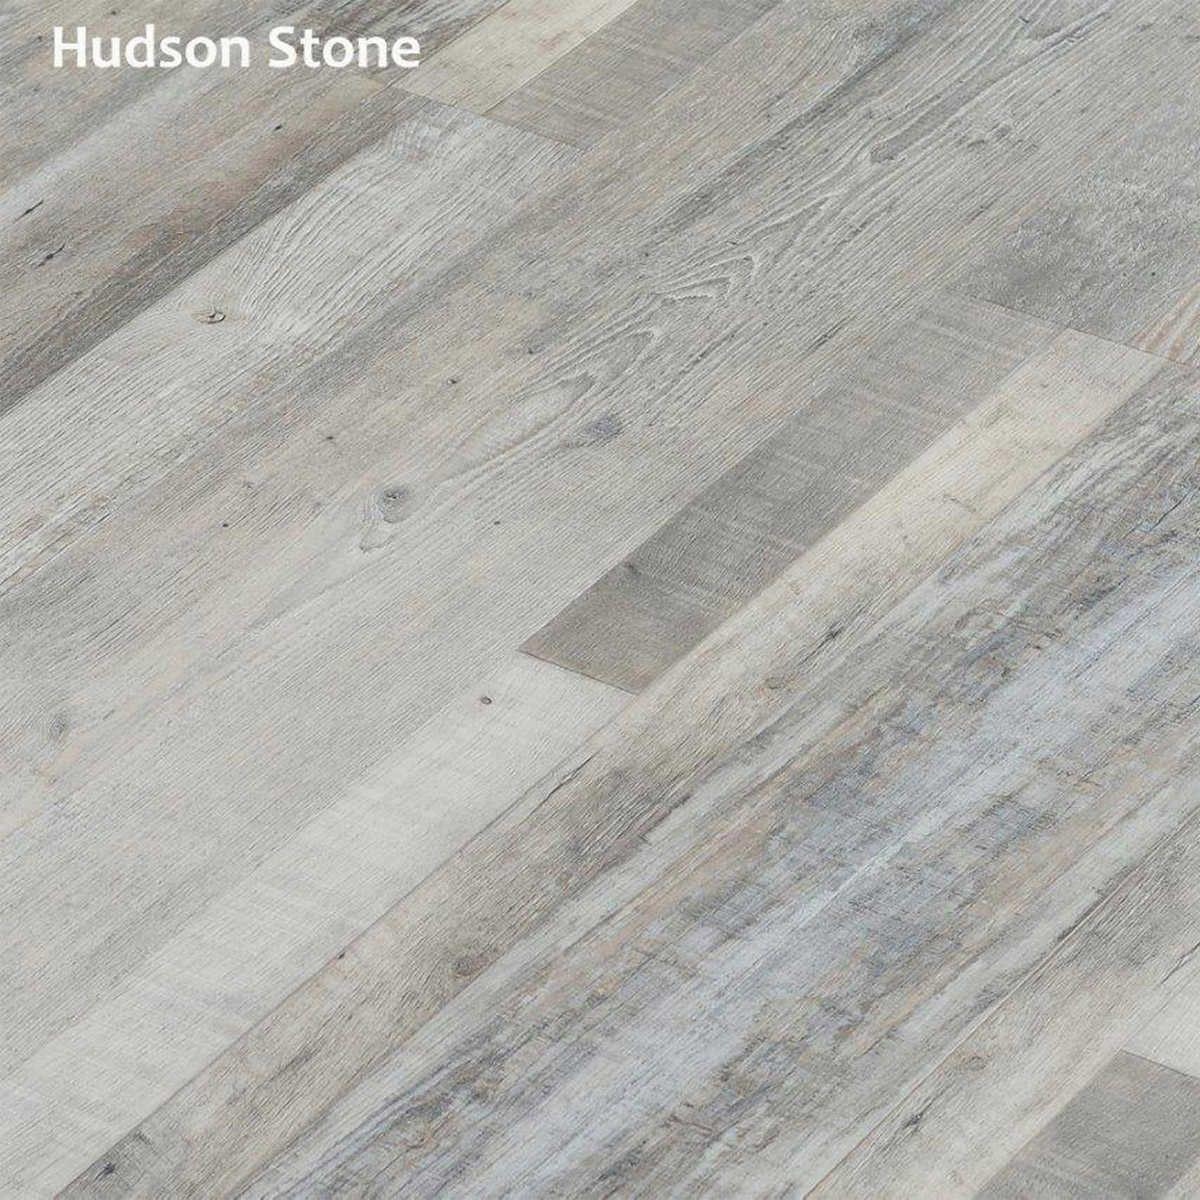 Pin by Neilm on House Vinyl plank, Vinyl plank flooring